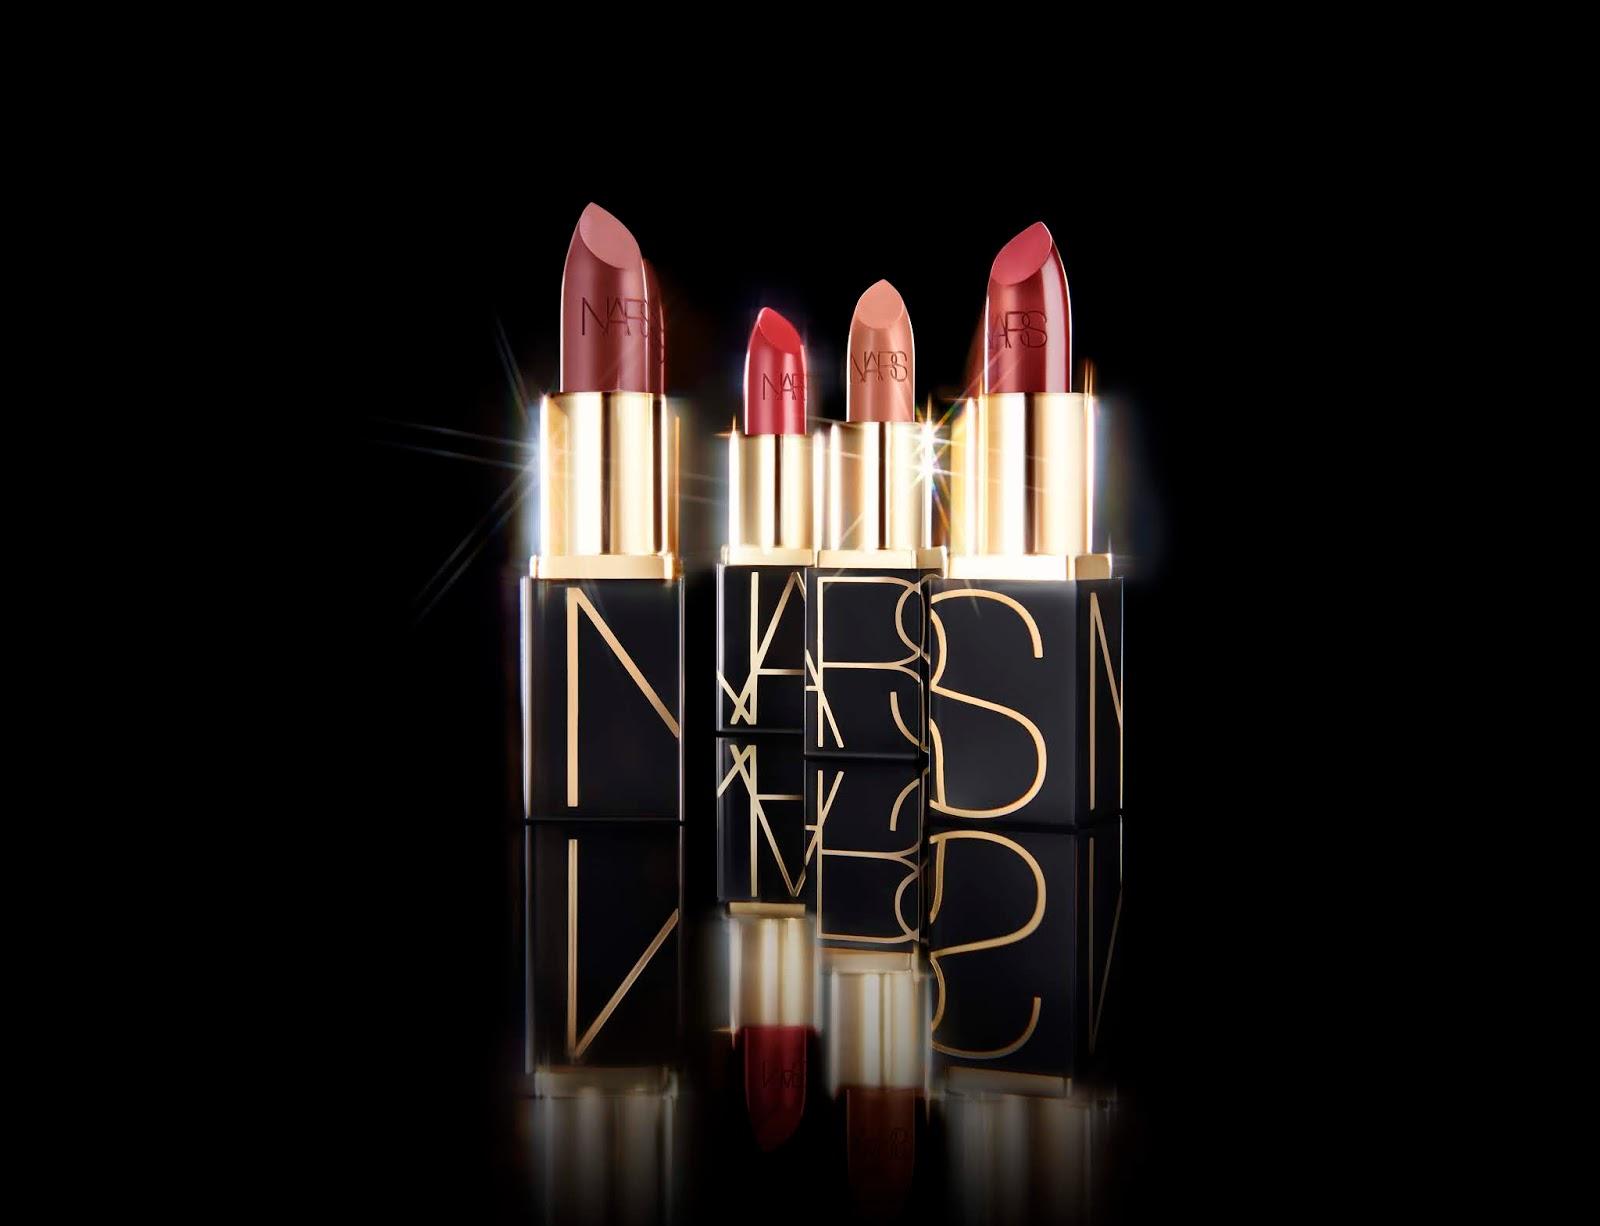 NARS-Studio-54-Never-Enough-Mini-Lipstick-Coffret-Stylized-Image